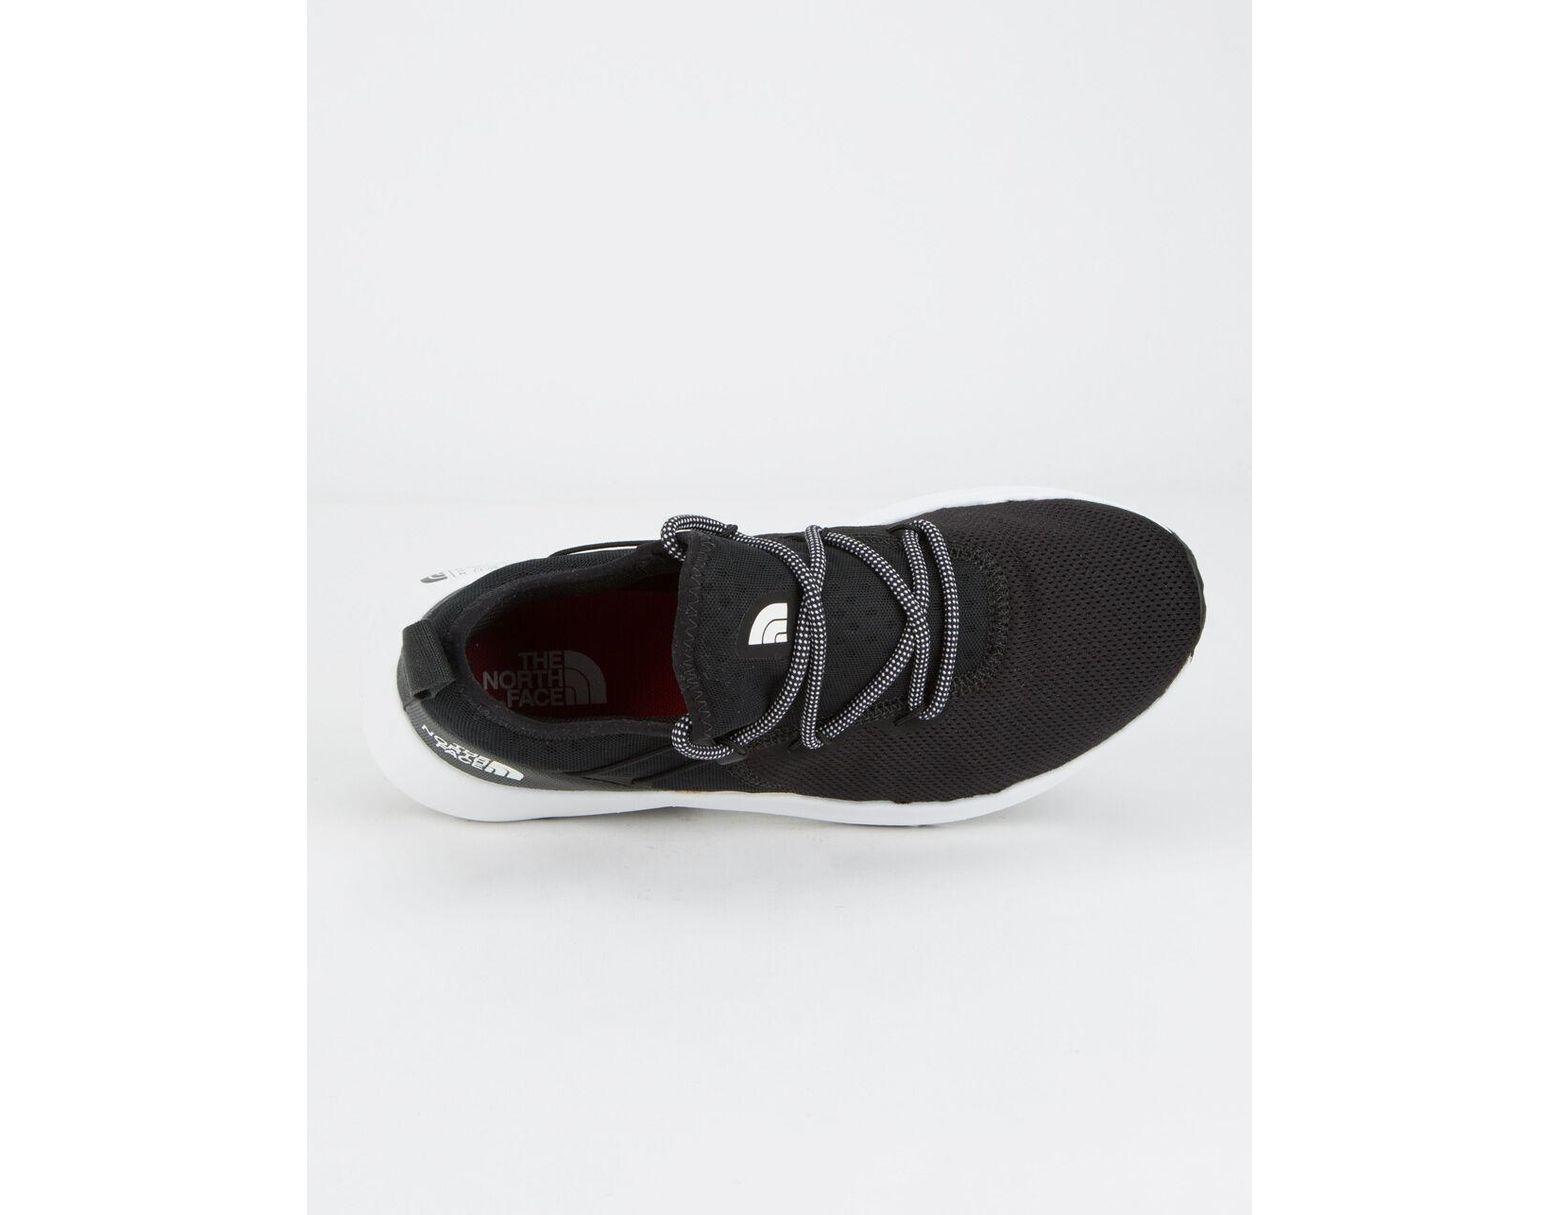 a7d9845c0 The North Face Surge Highgate Black Womens Shoes